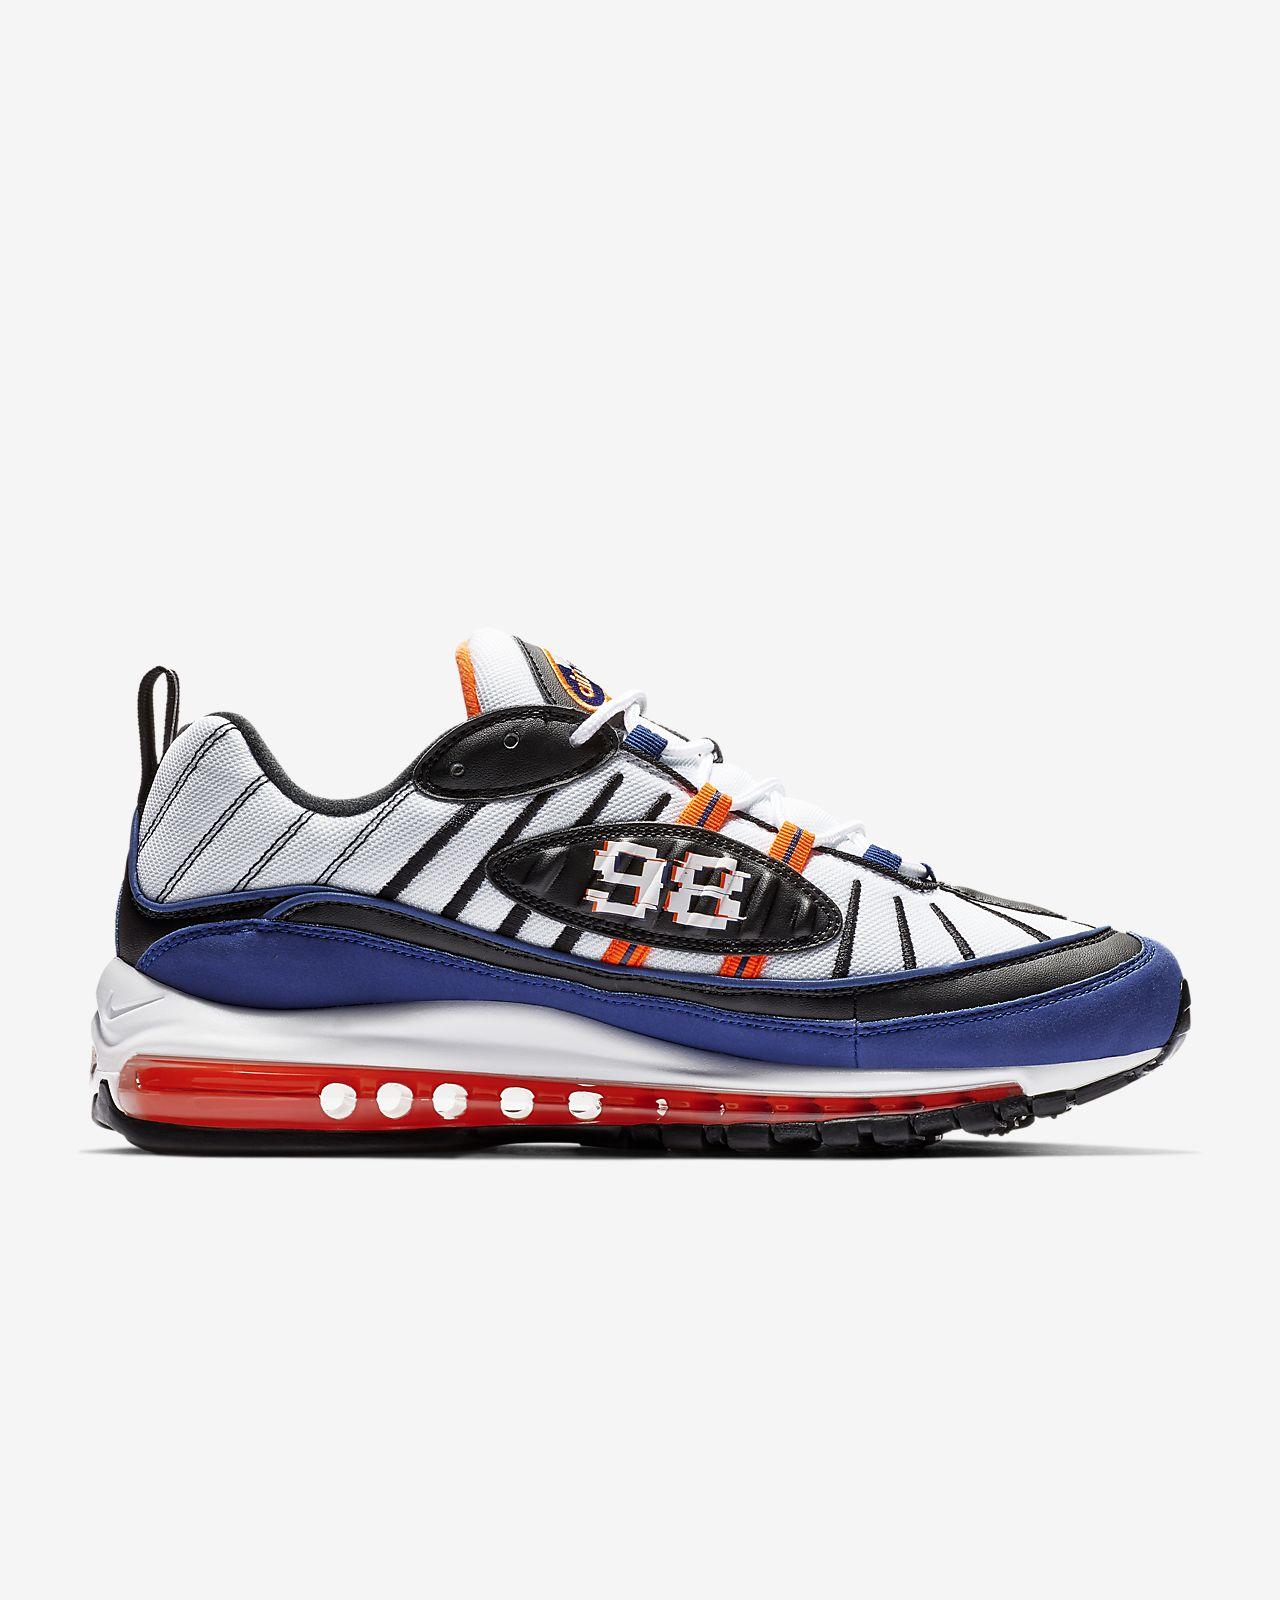 the best attitude 0bd7c 66ff9 Men s Shoe. Nike Air Max 98. €180